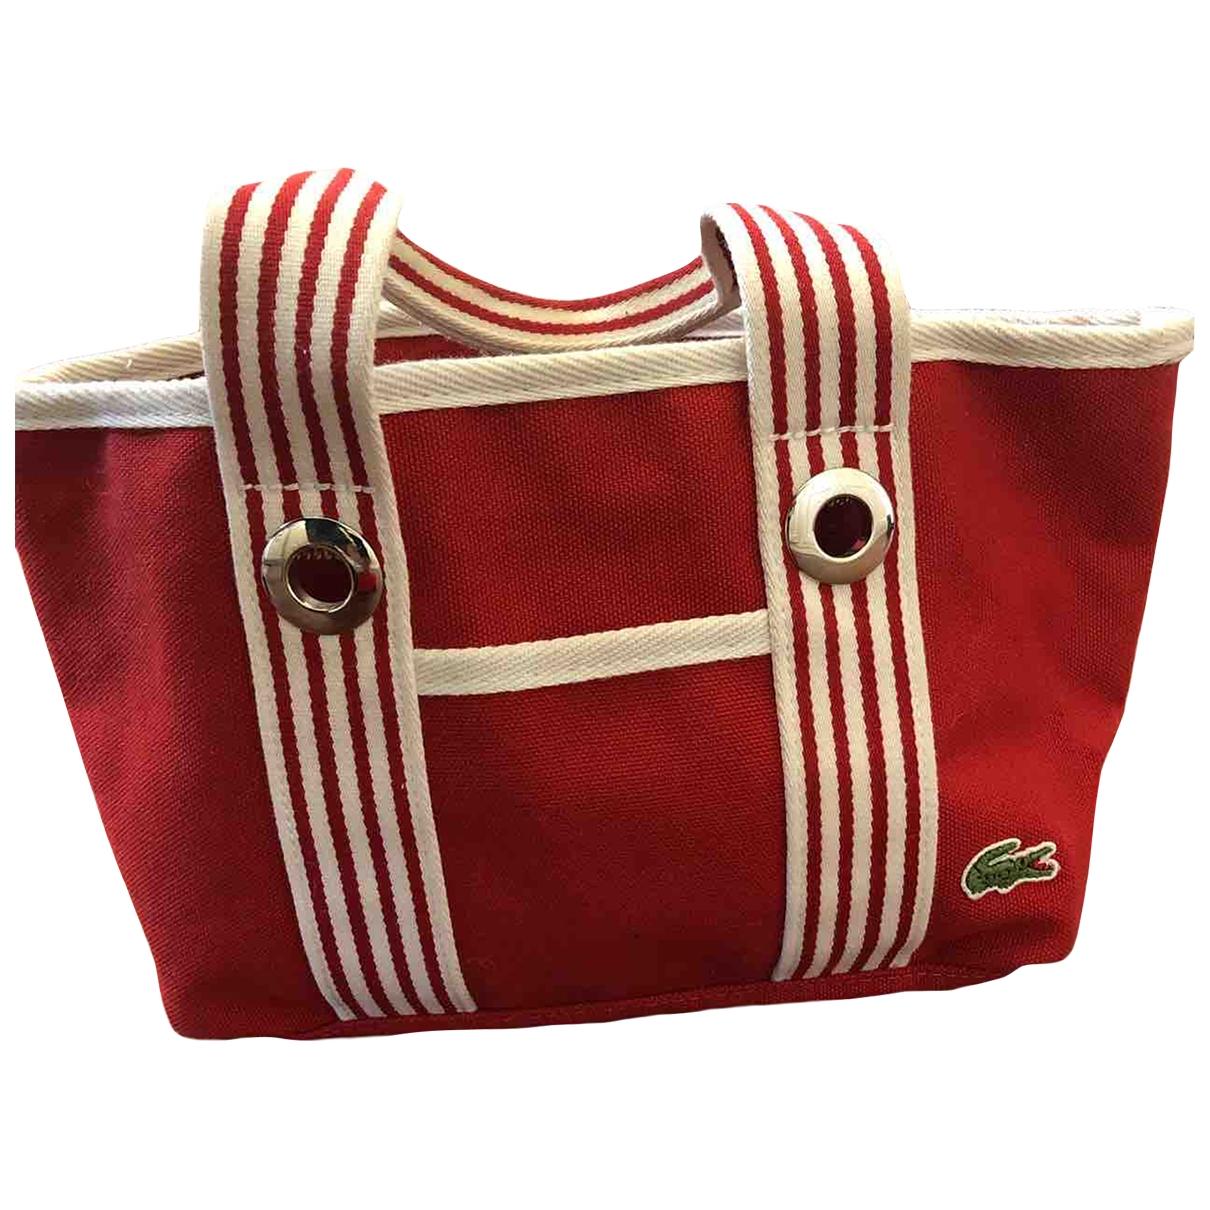 Lacoste \N Red Cloth handbag for Women \N